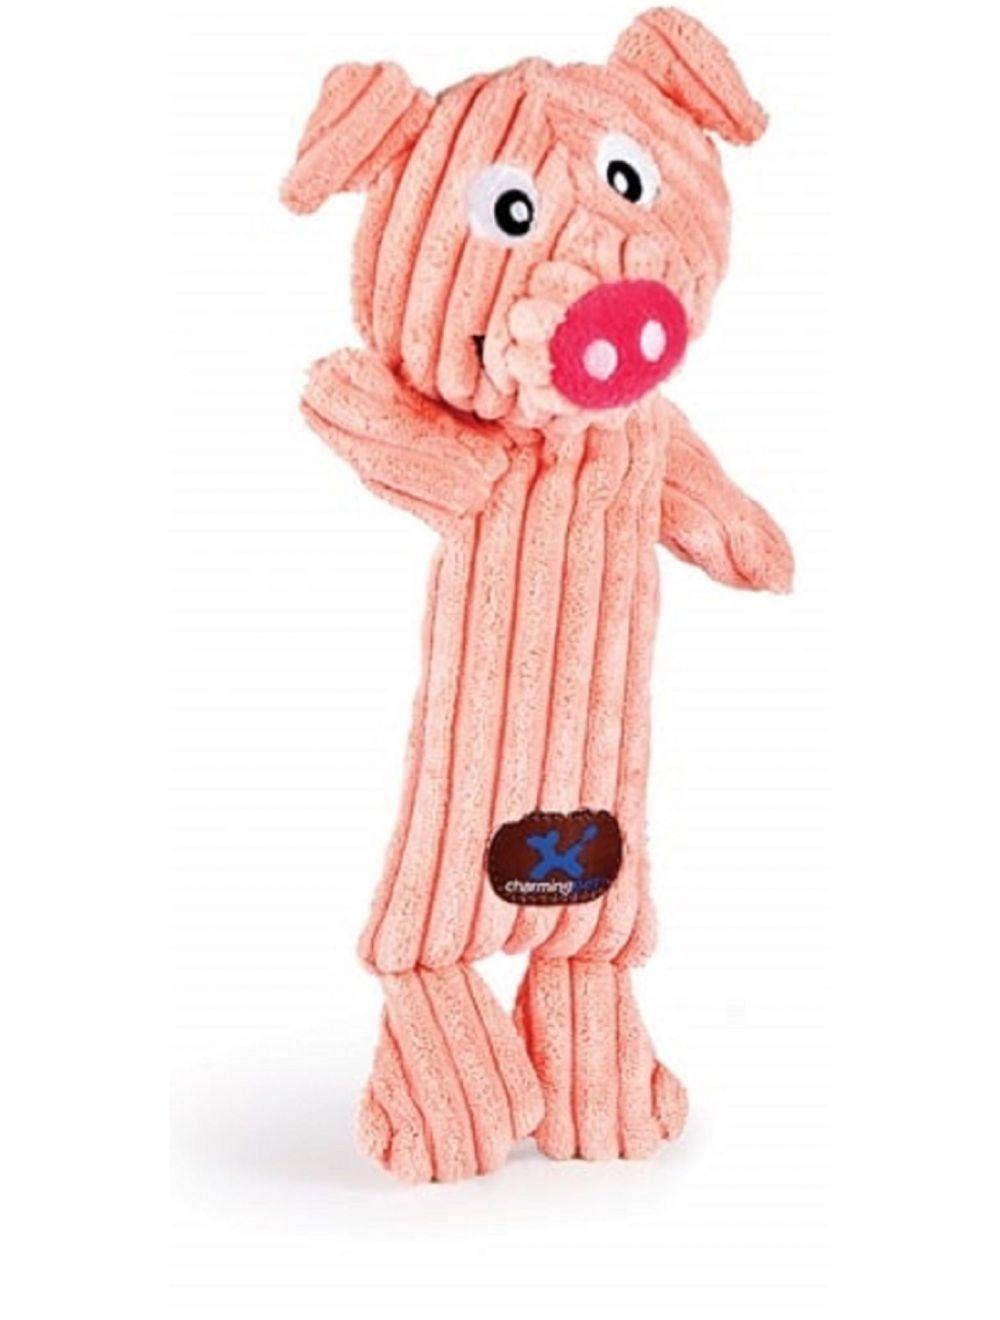 Charming pet peluche tennis head cerdo